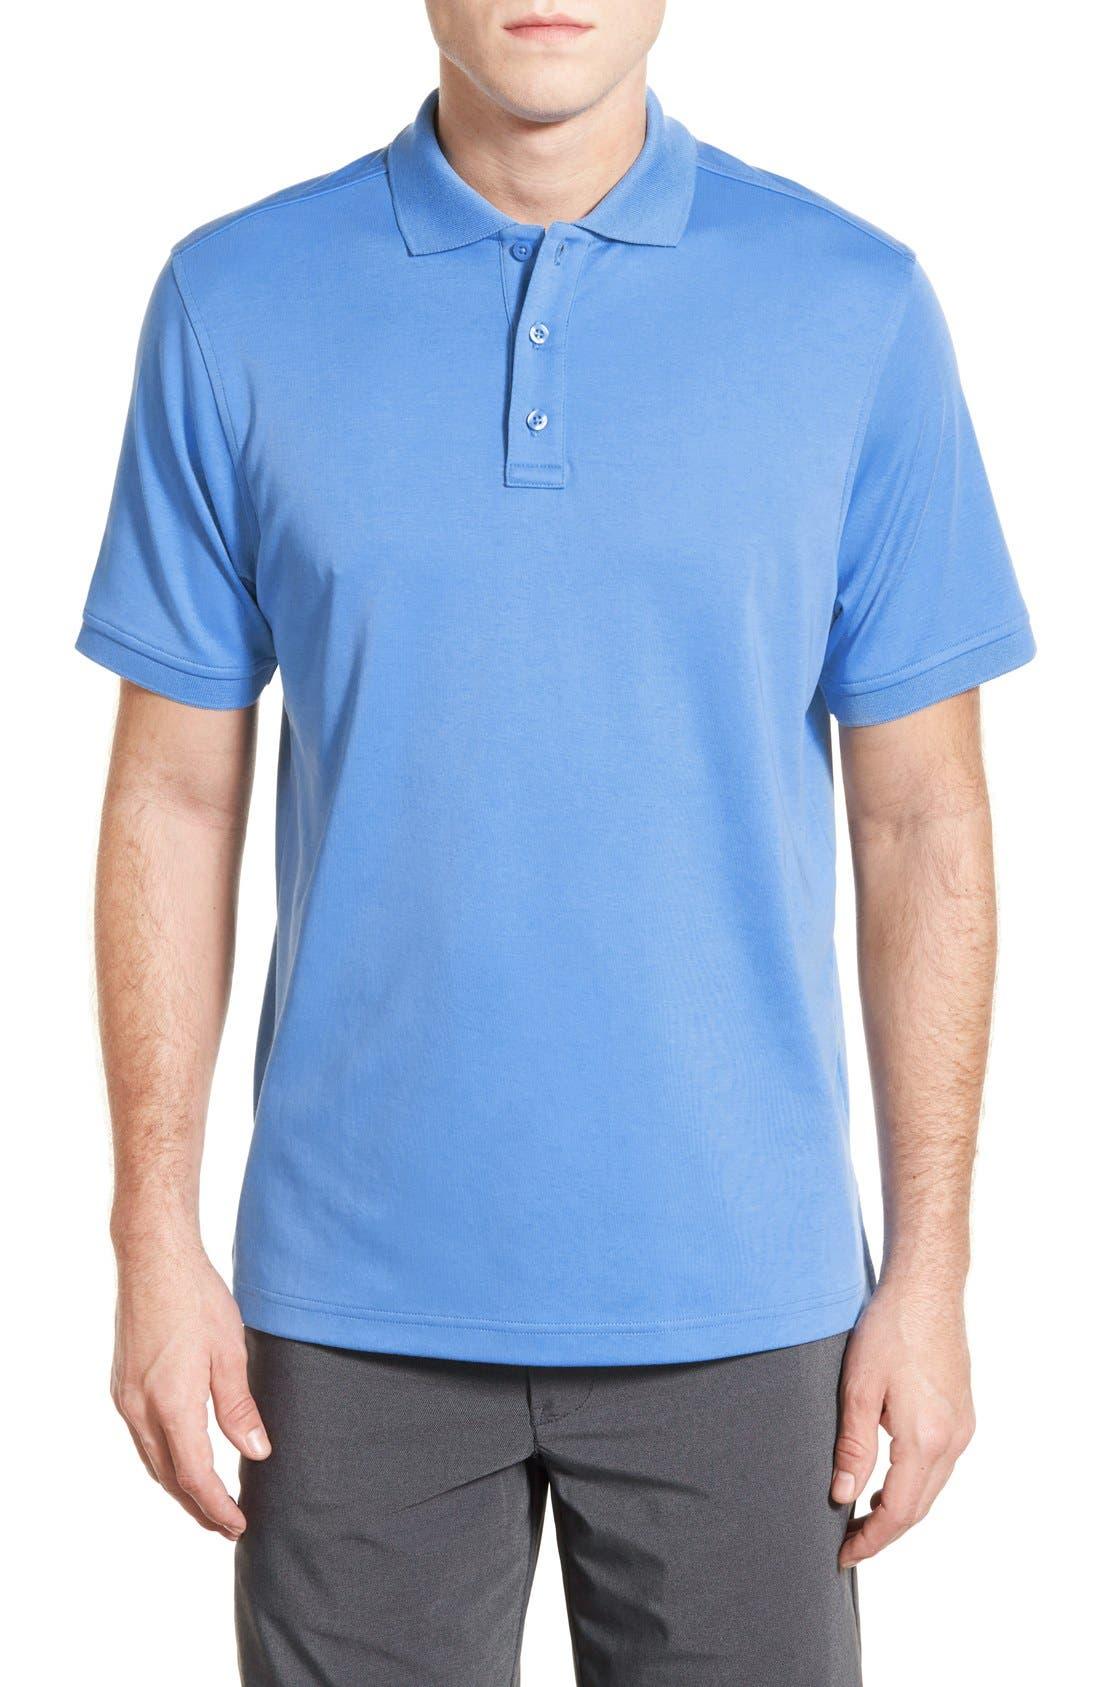 Mens Polo Shirts Nordstrom